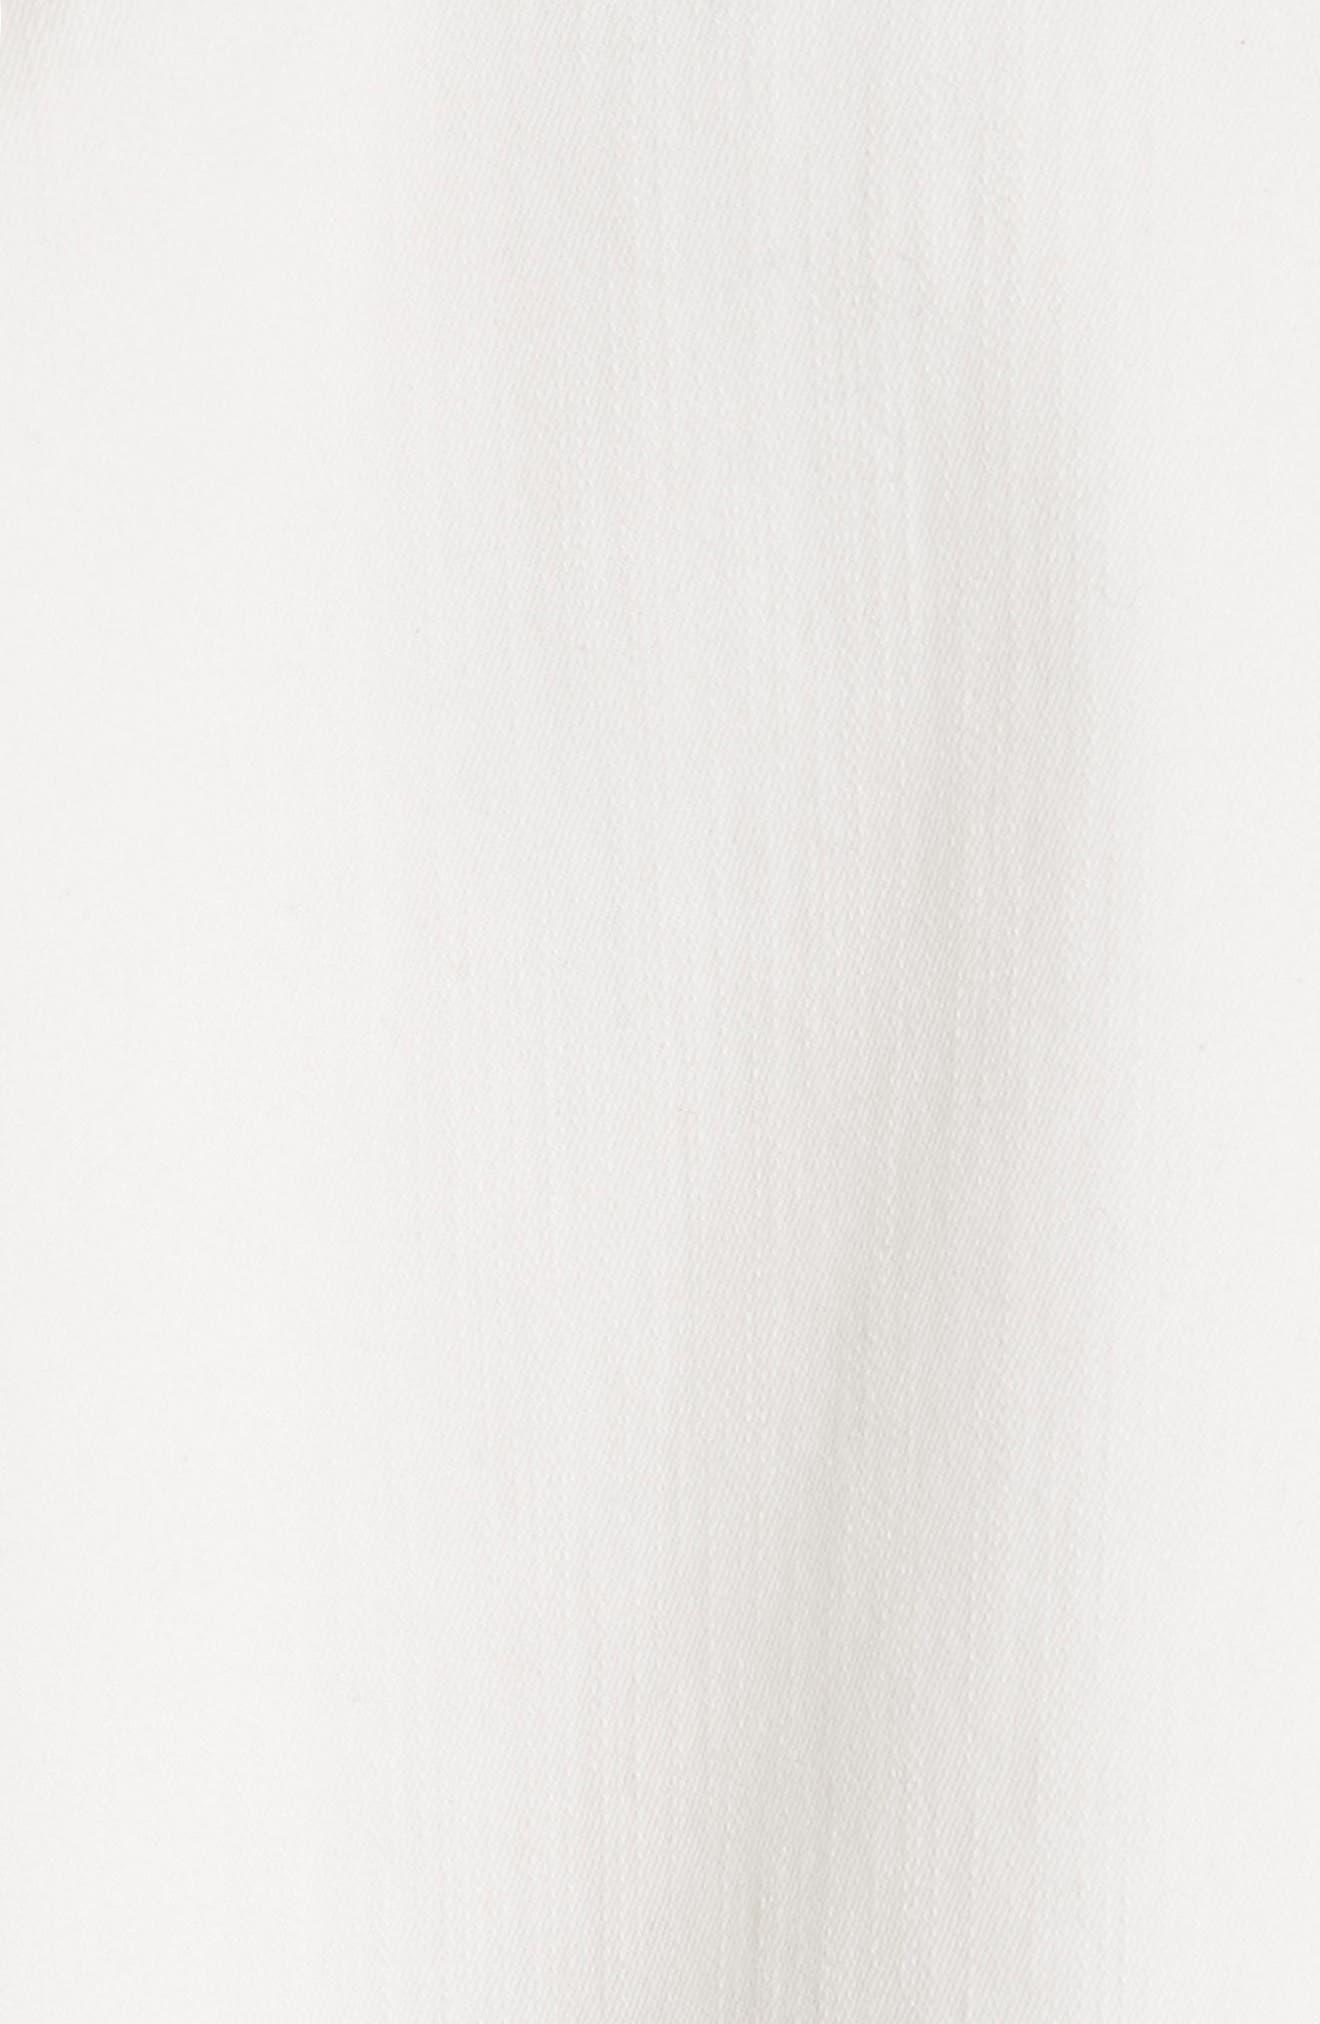 Tinsley Denim Crop Top,                             Alternate thumbnail 5, color,                             White